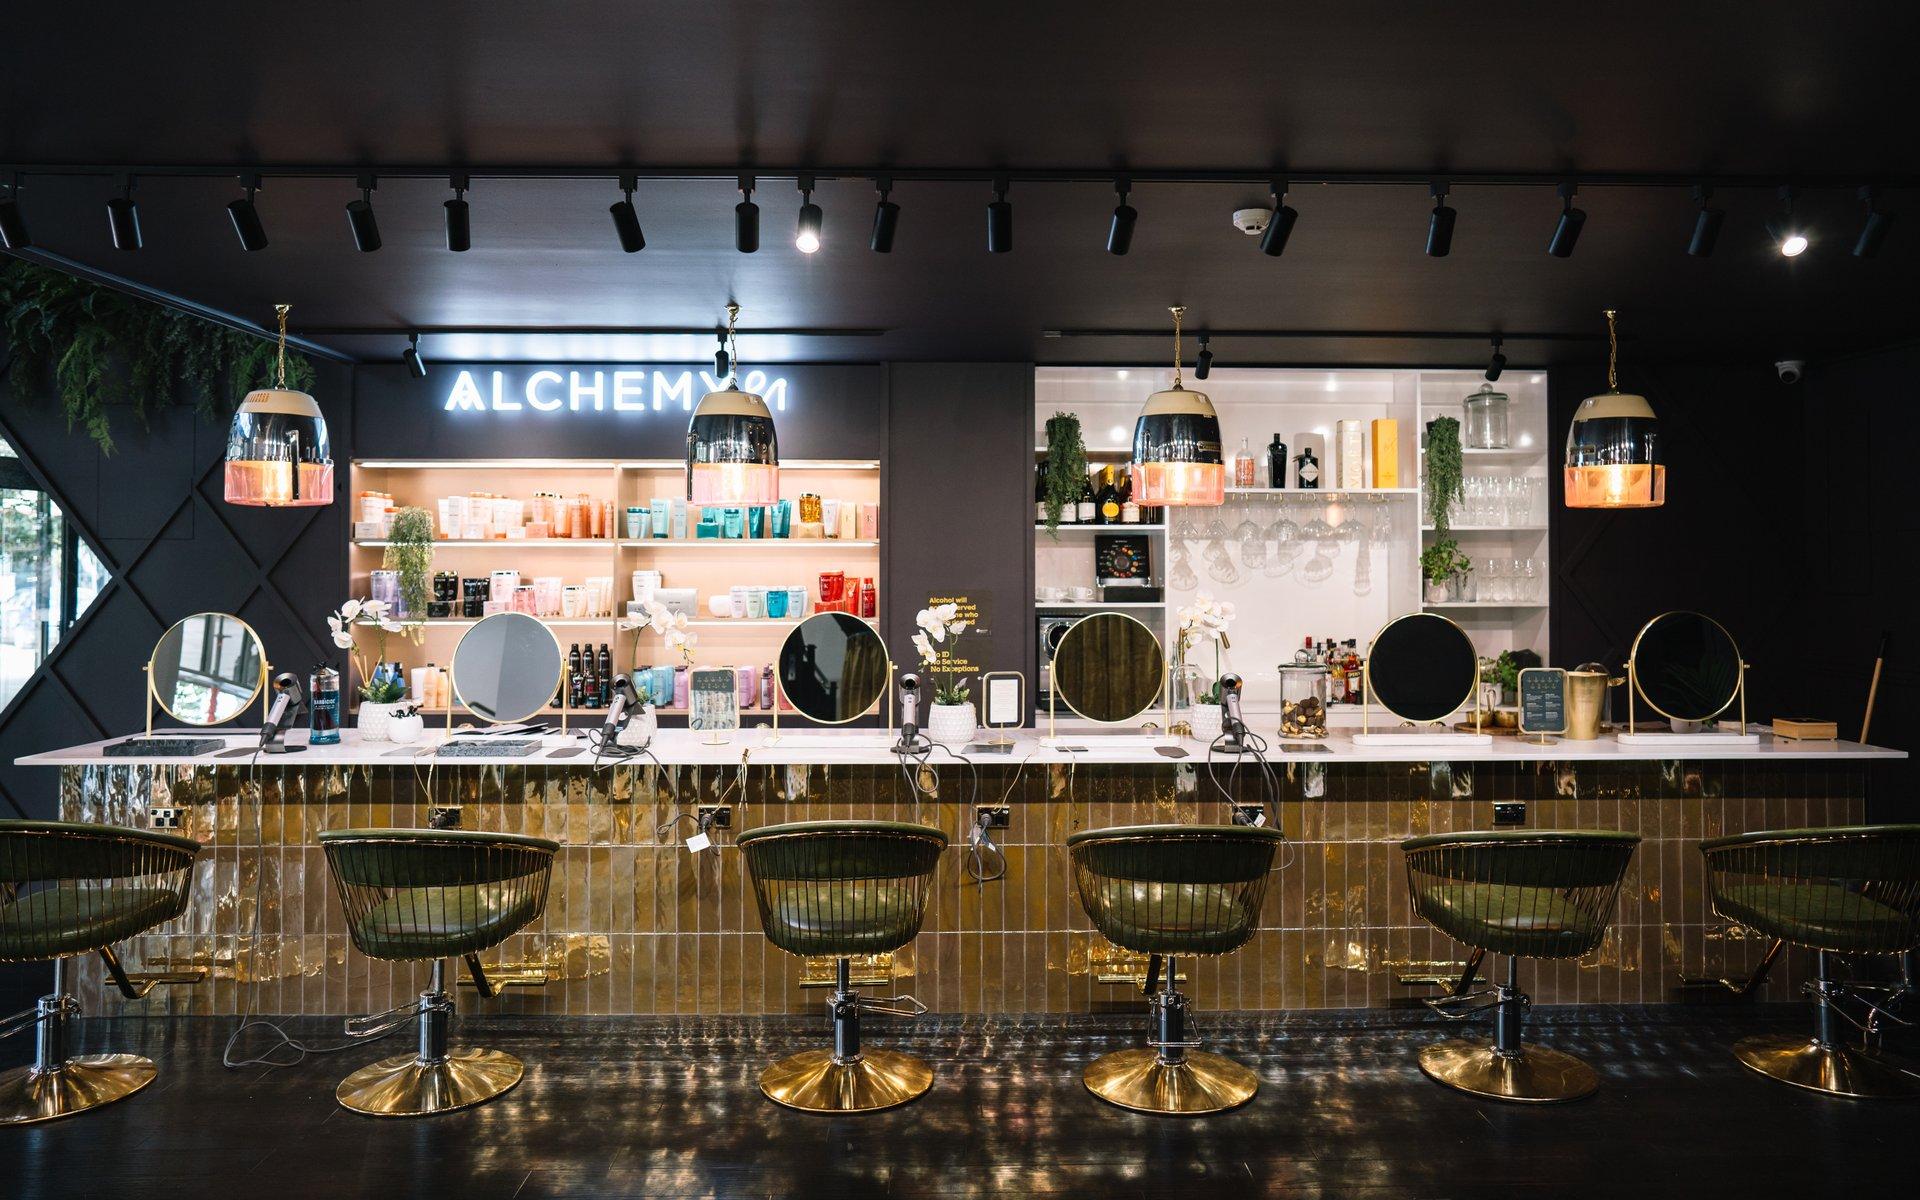 Business Success Story: Alchemy & I – From UK to Palmy